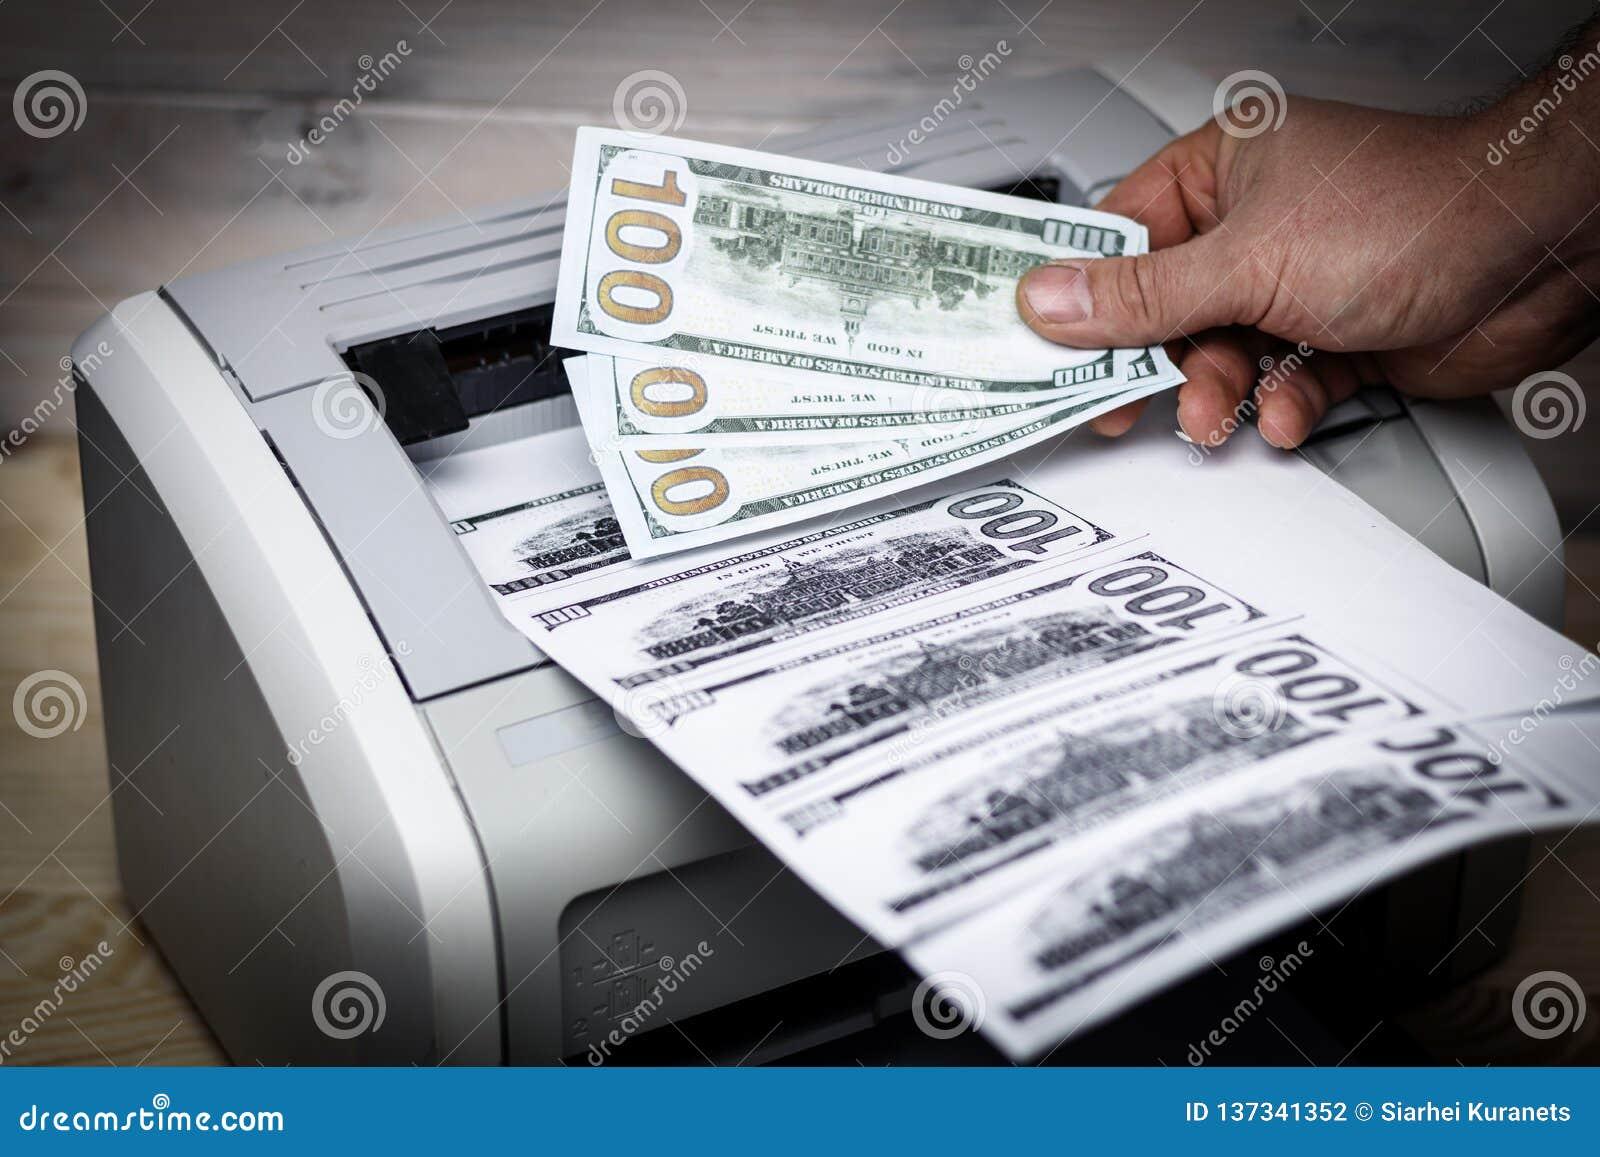 Printed Dollars  Home Printer  Concept, Crime, Fake Money